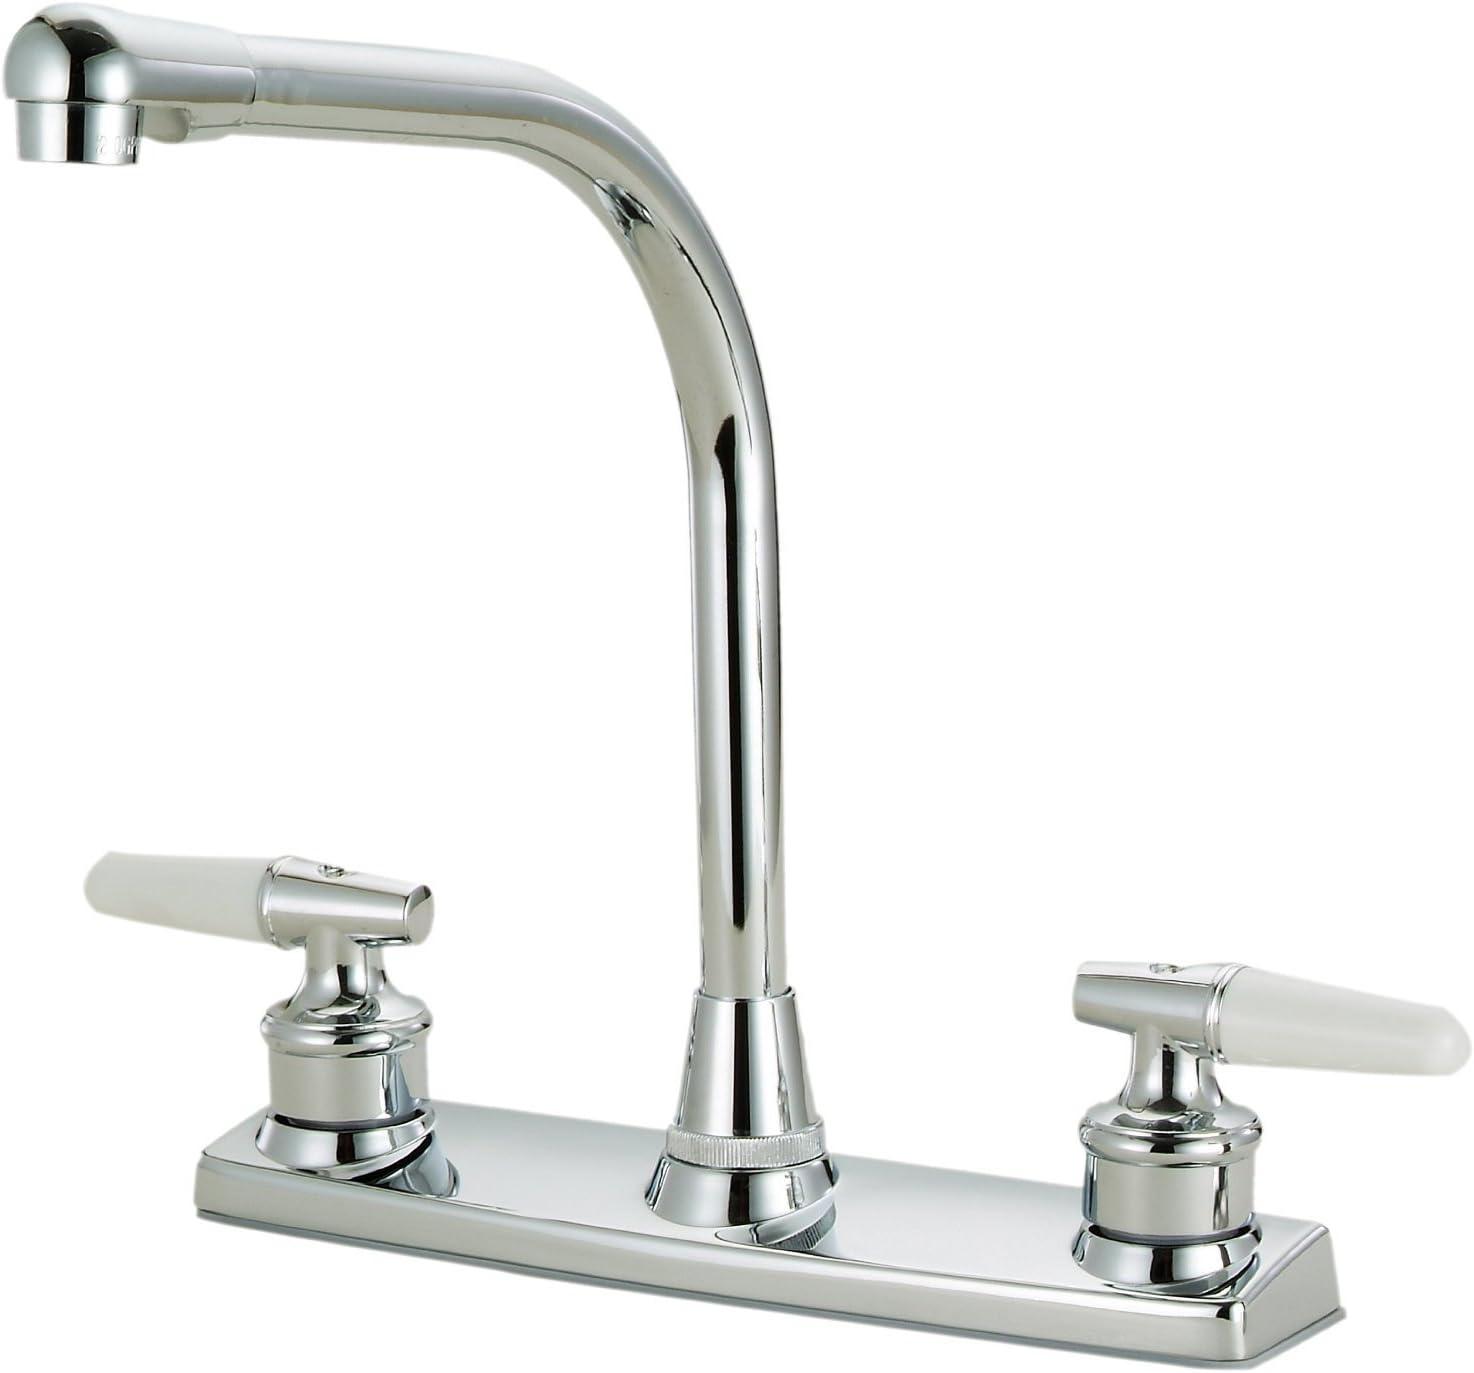 Hardware House 123334 Kitchen Faucet, Chrome